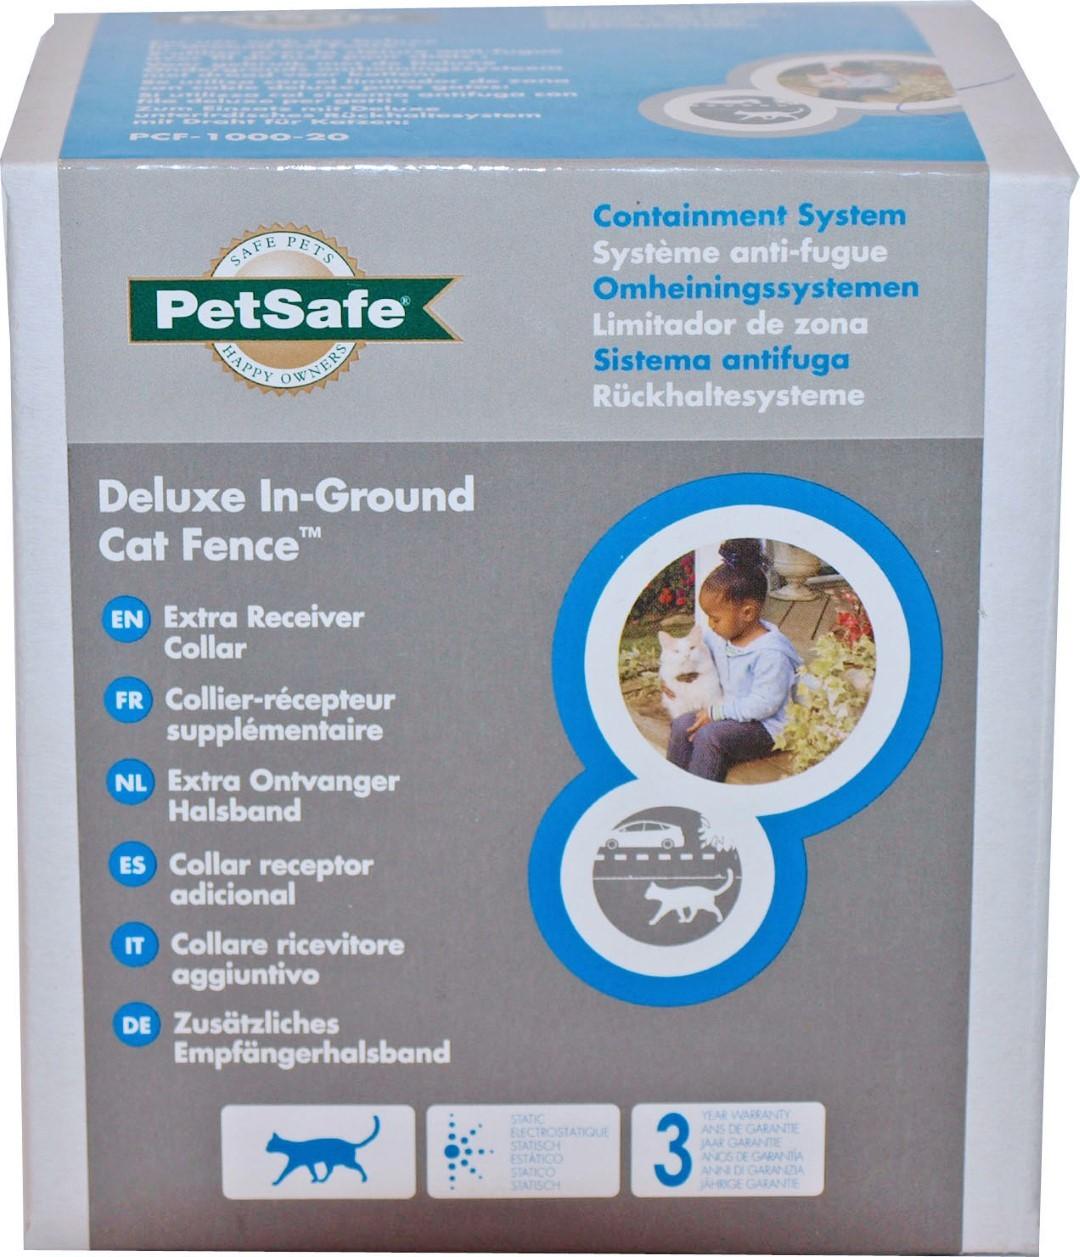 PetSafe extra halsband cat fence PCF-275